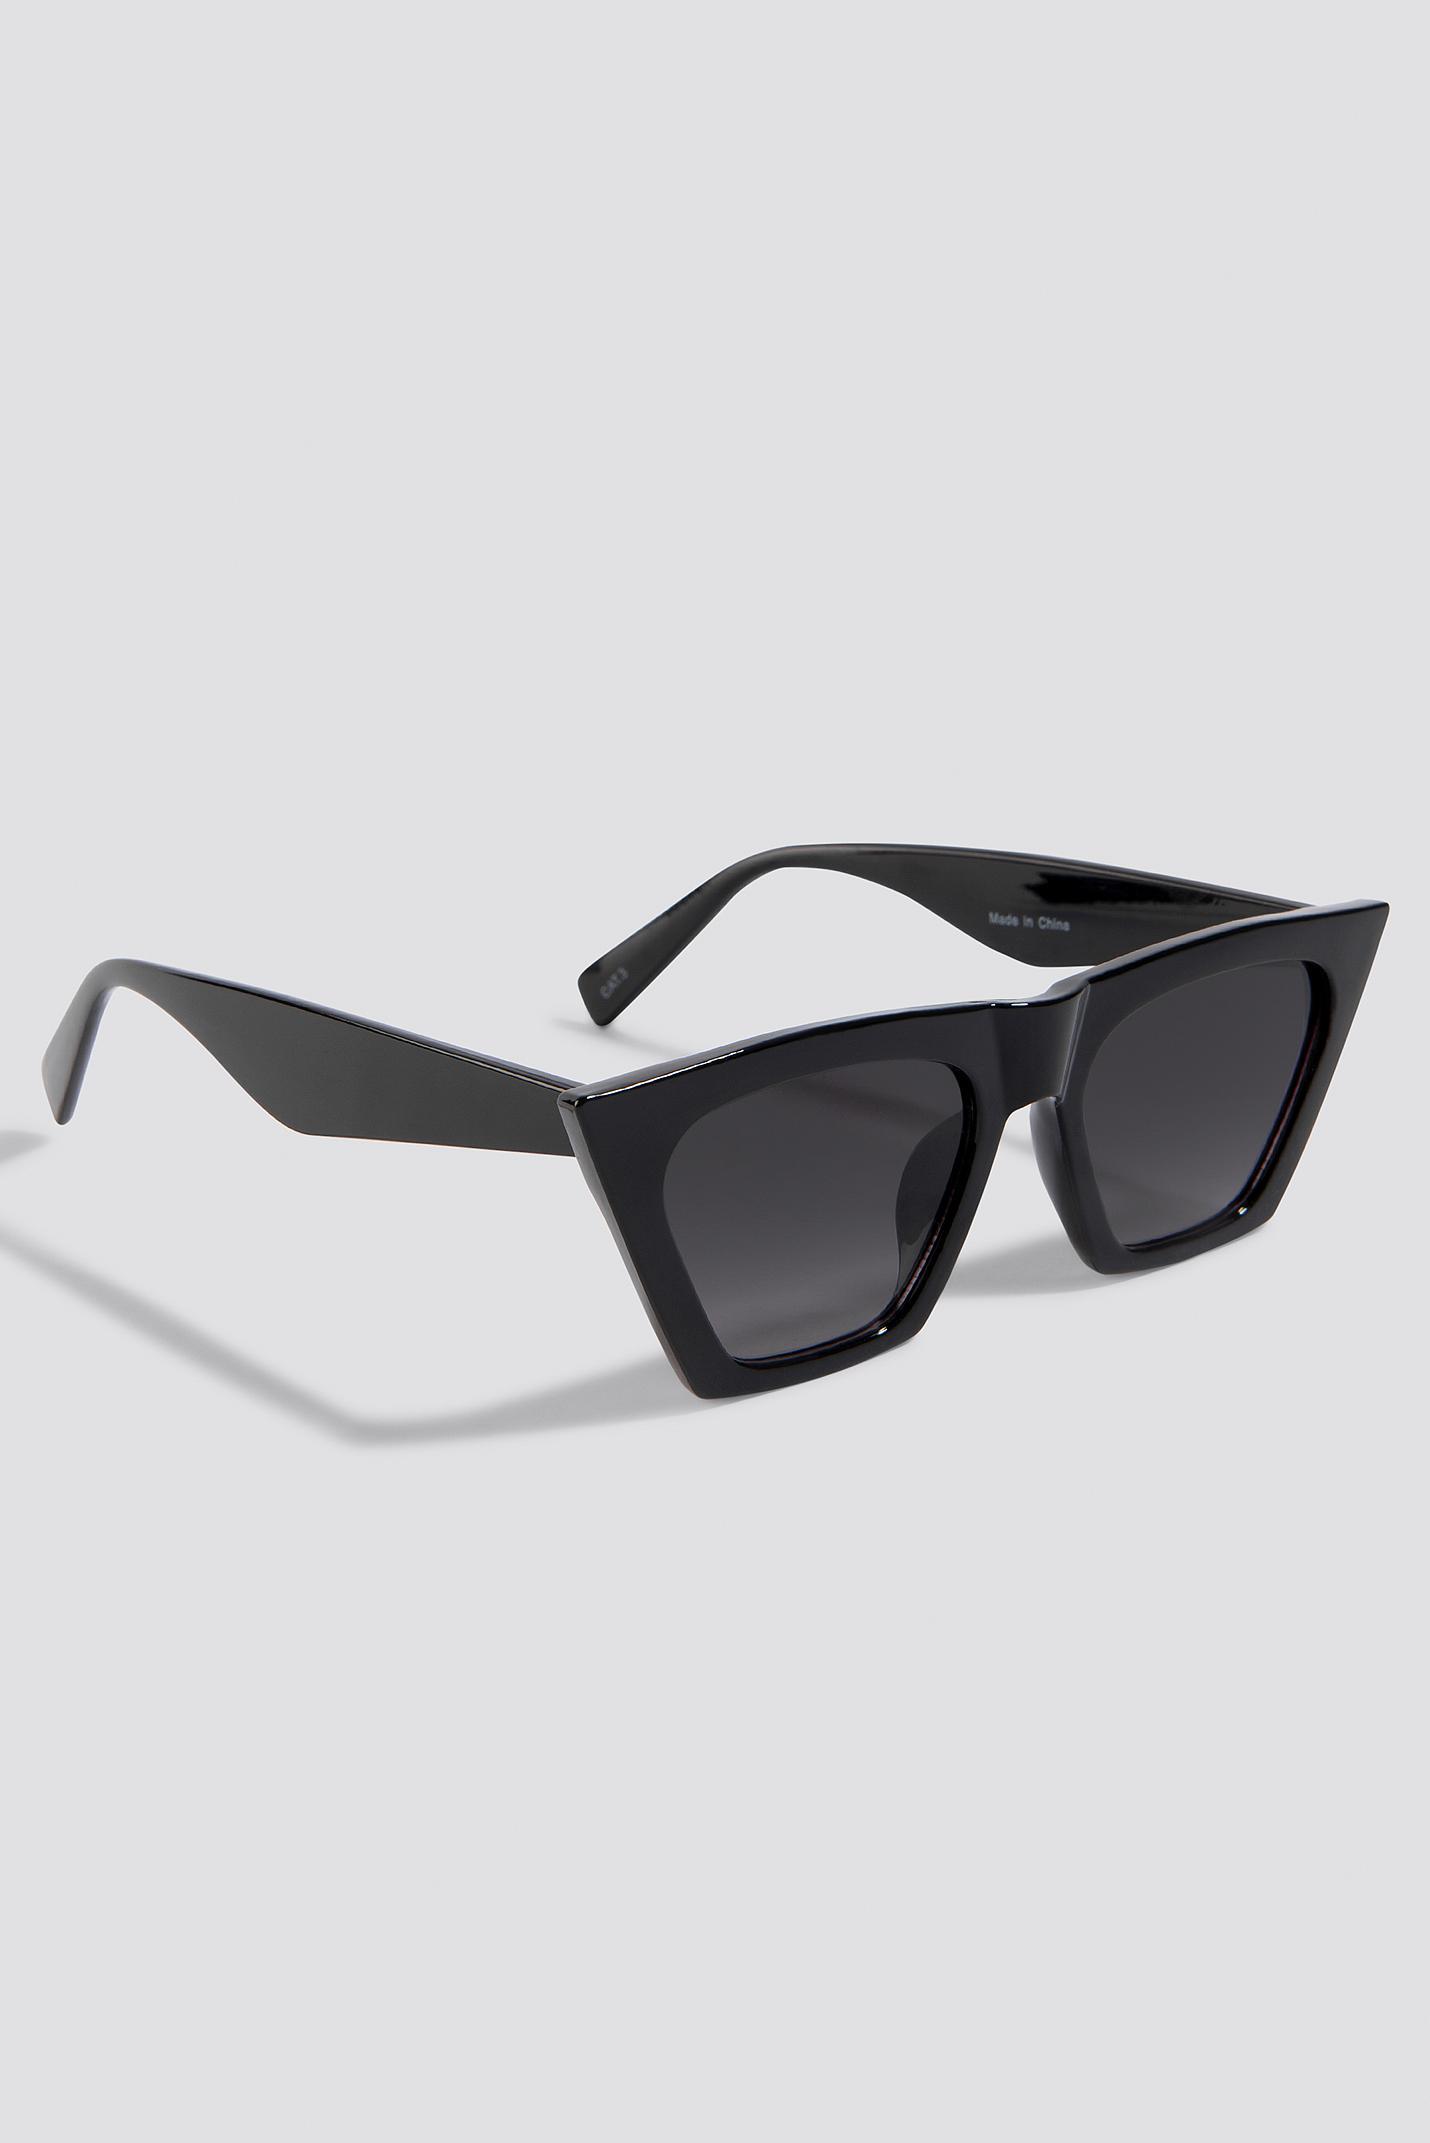 8c1223516c487 NA-KD Sharp Square Cateye Sunglasses Black in Black - Lyst